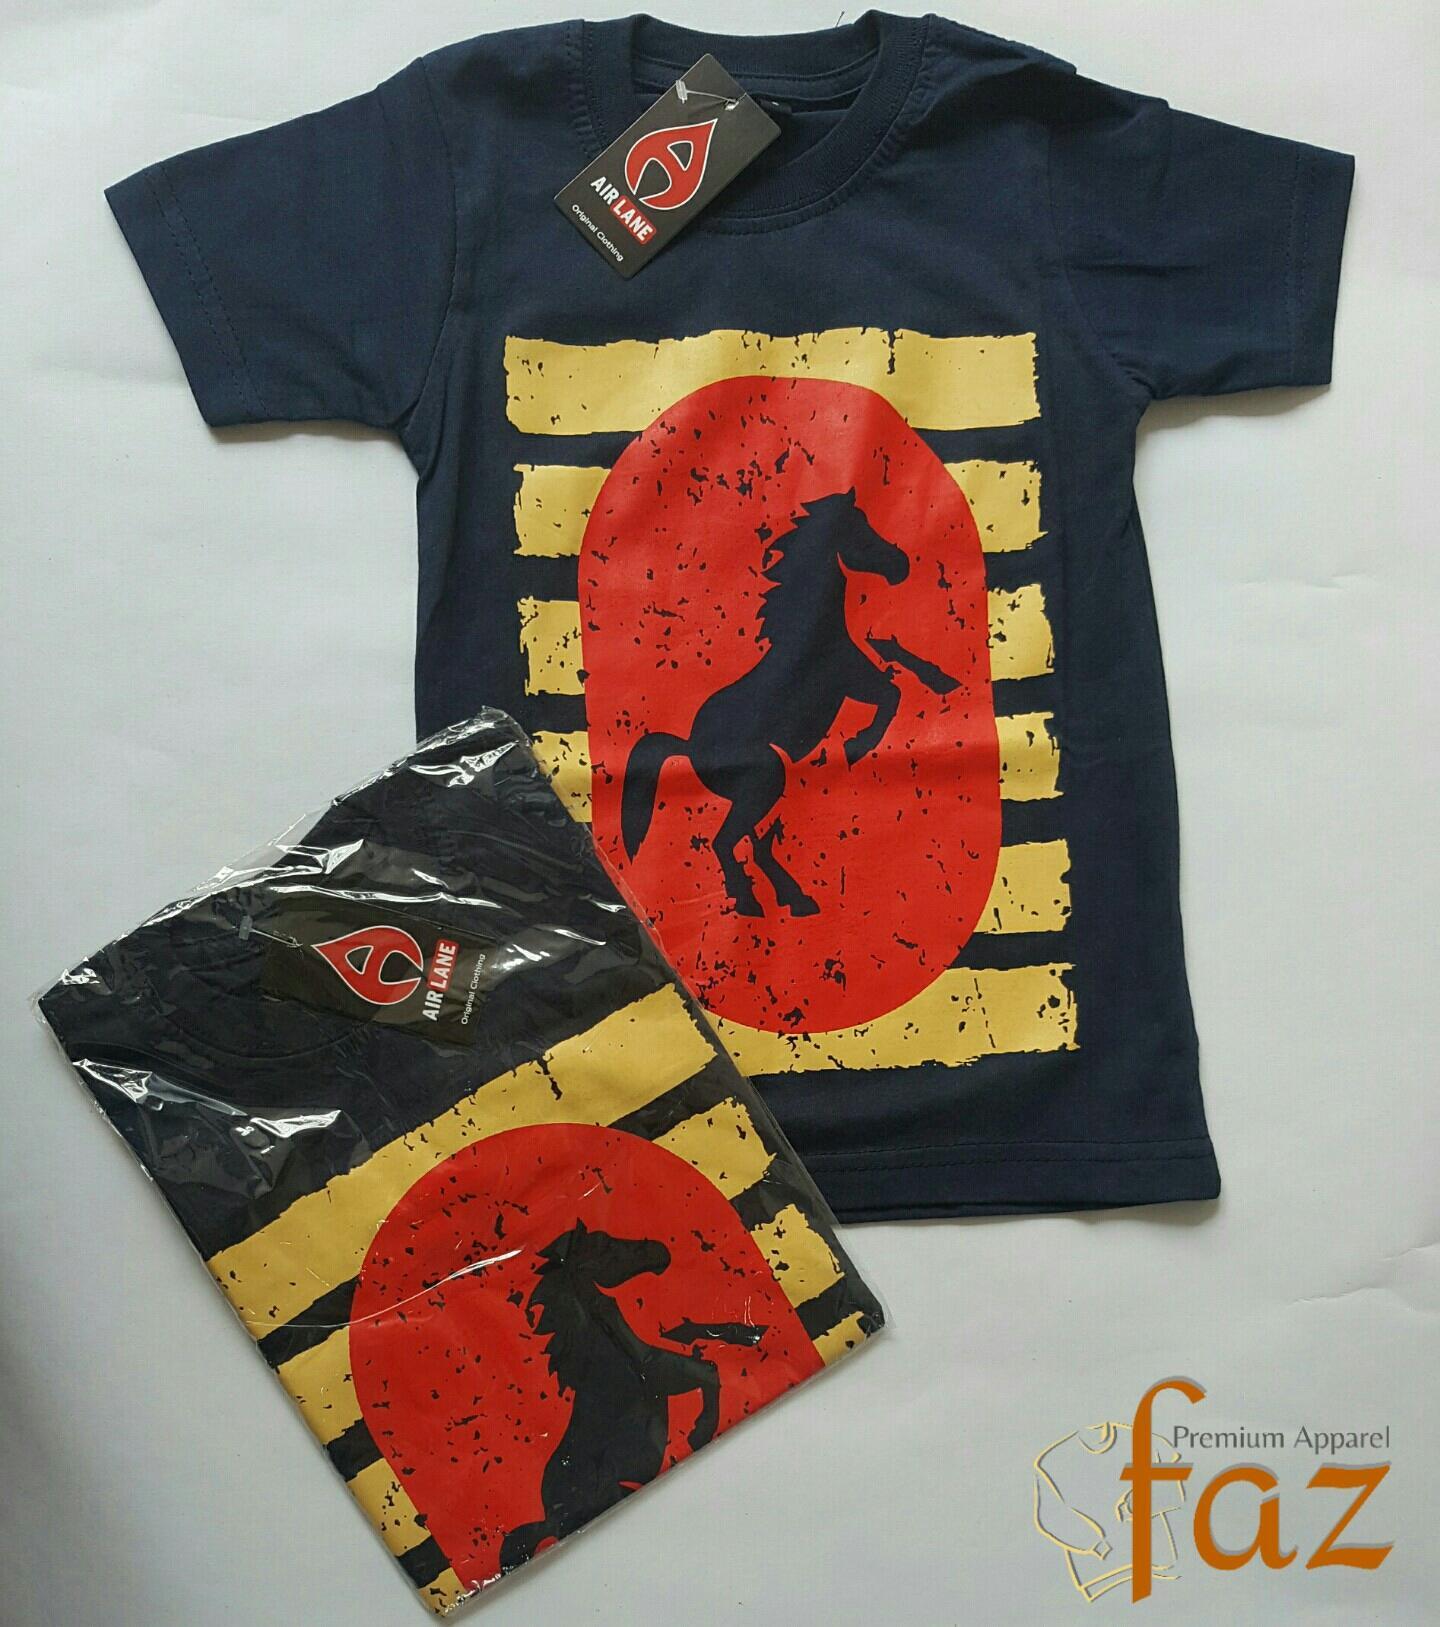 Kaos Anak Karakter - Motif Kuda